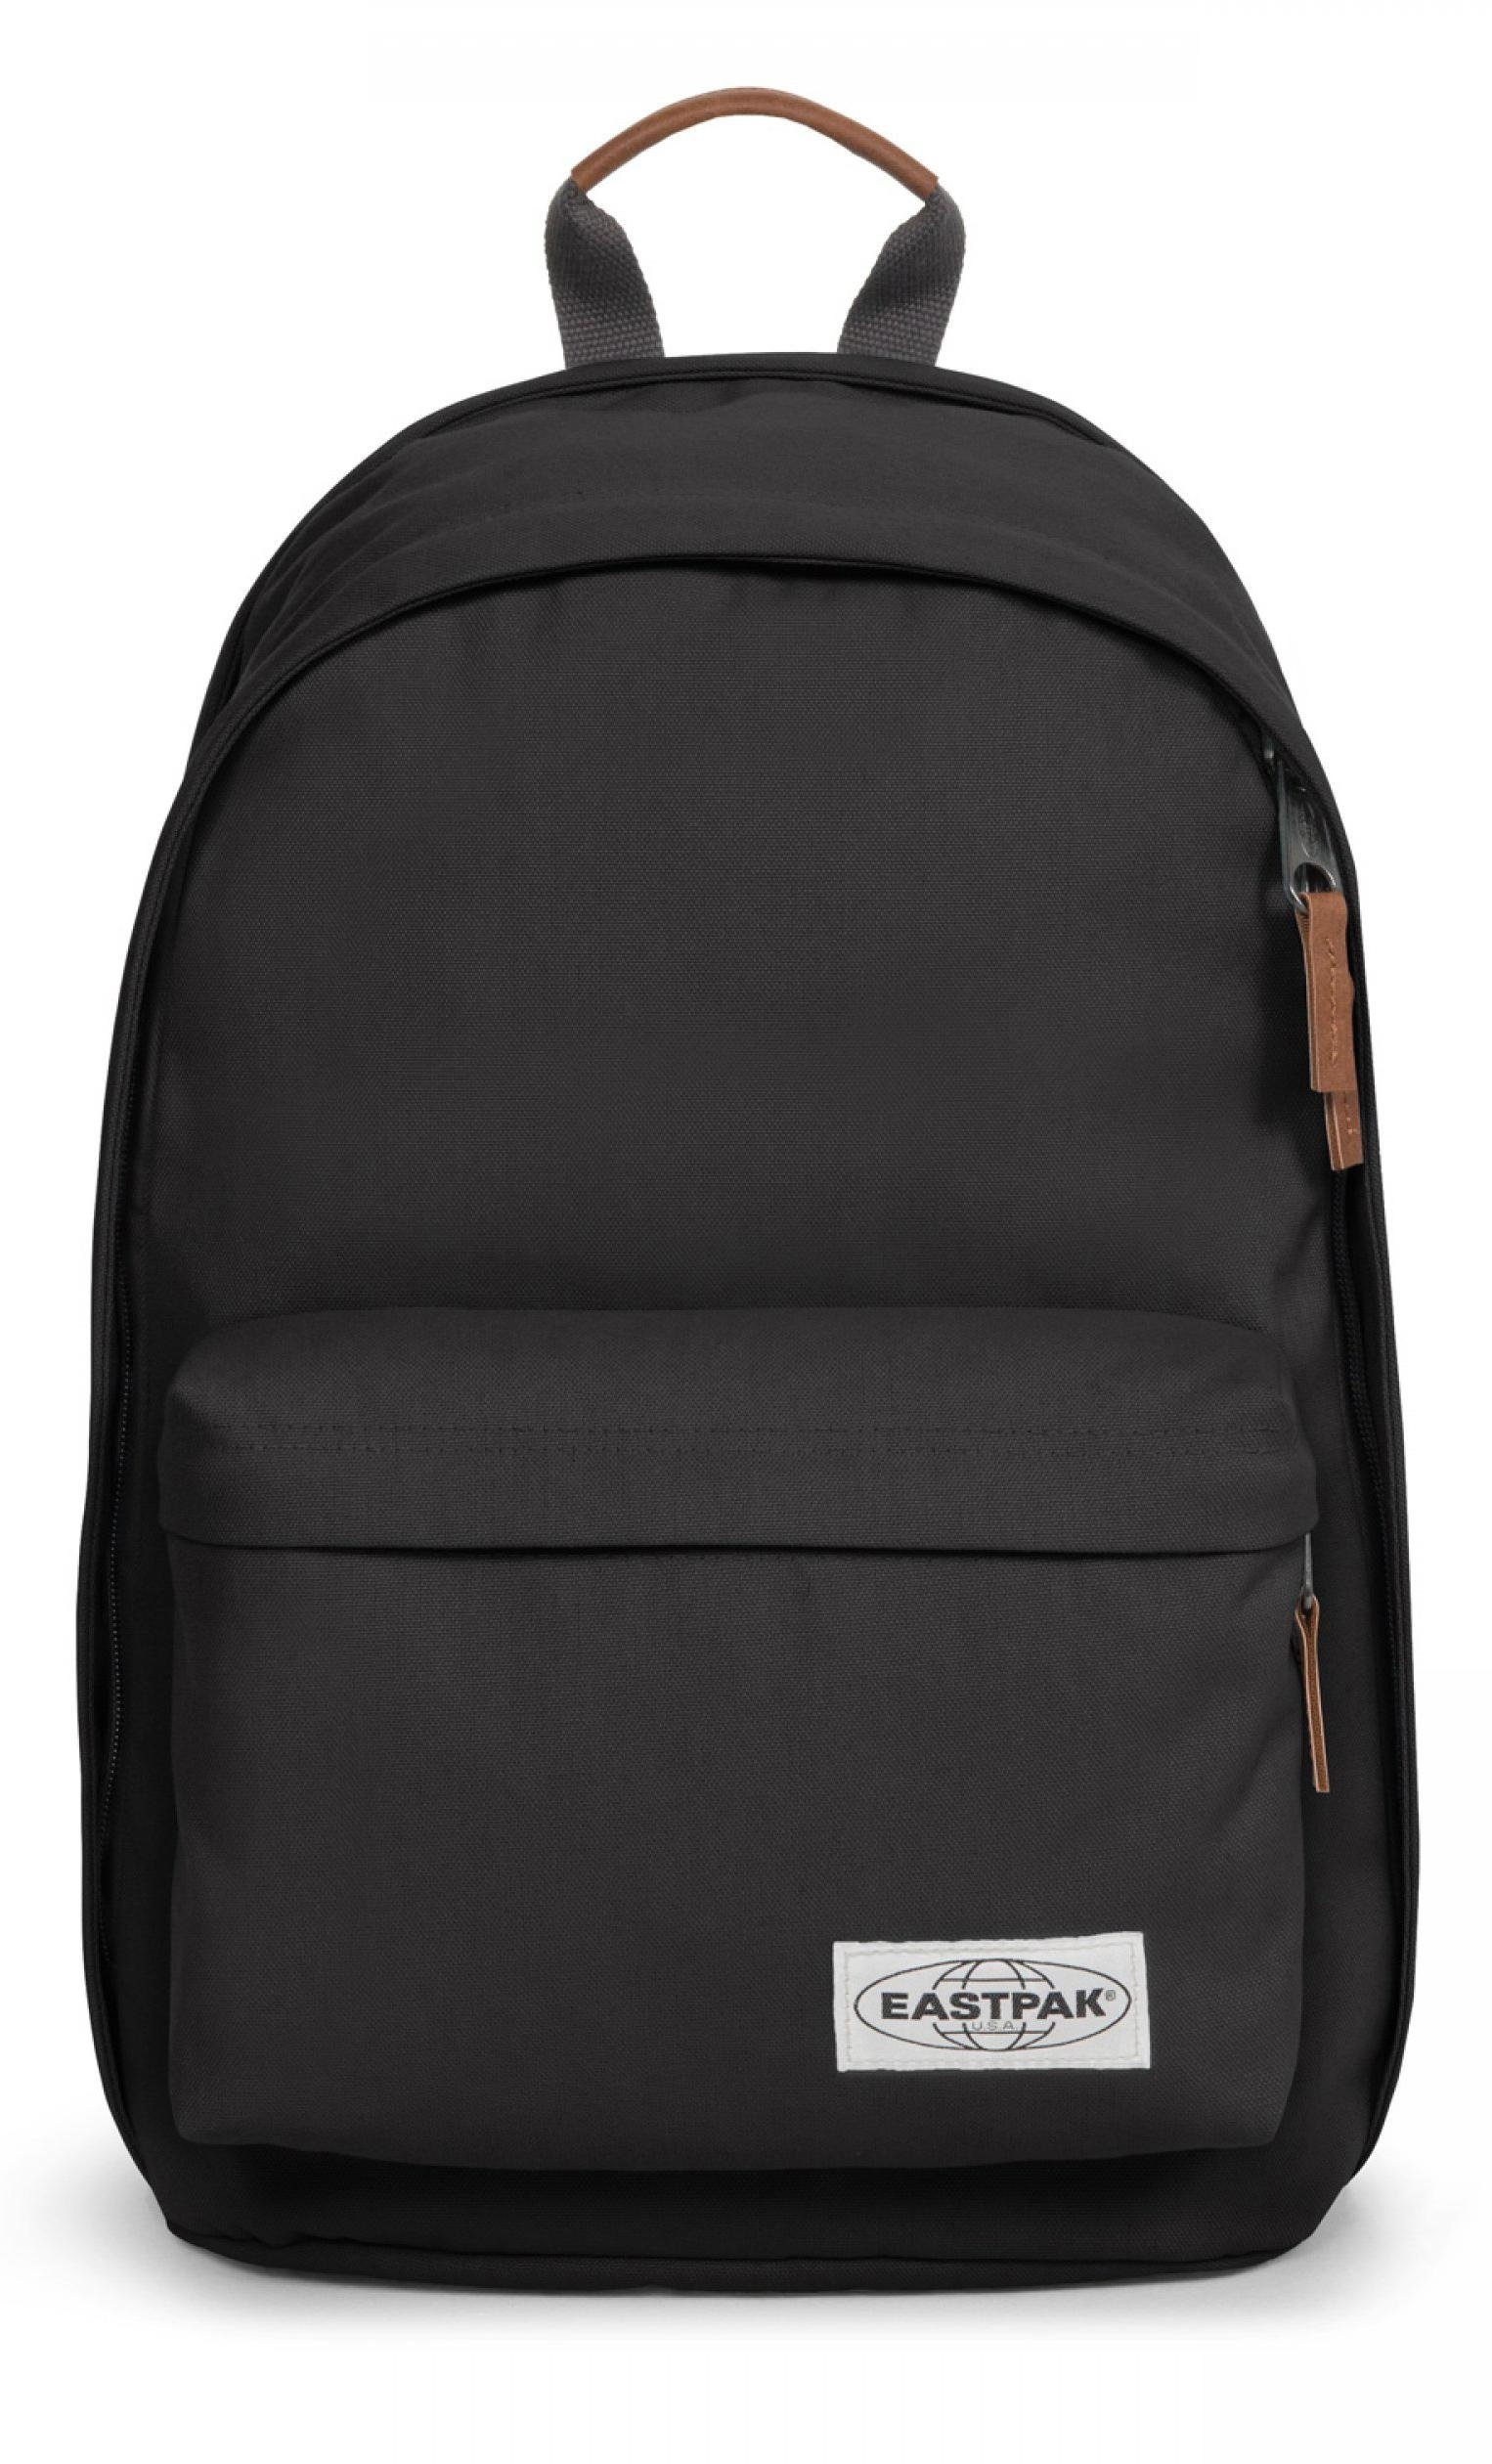 Eastpak schoolrugzak »BACK TO WORK graded black« online kopen op otto.nl